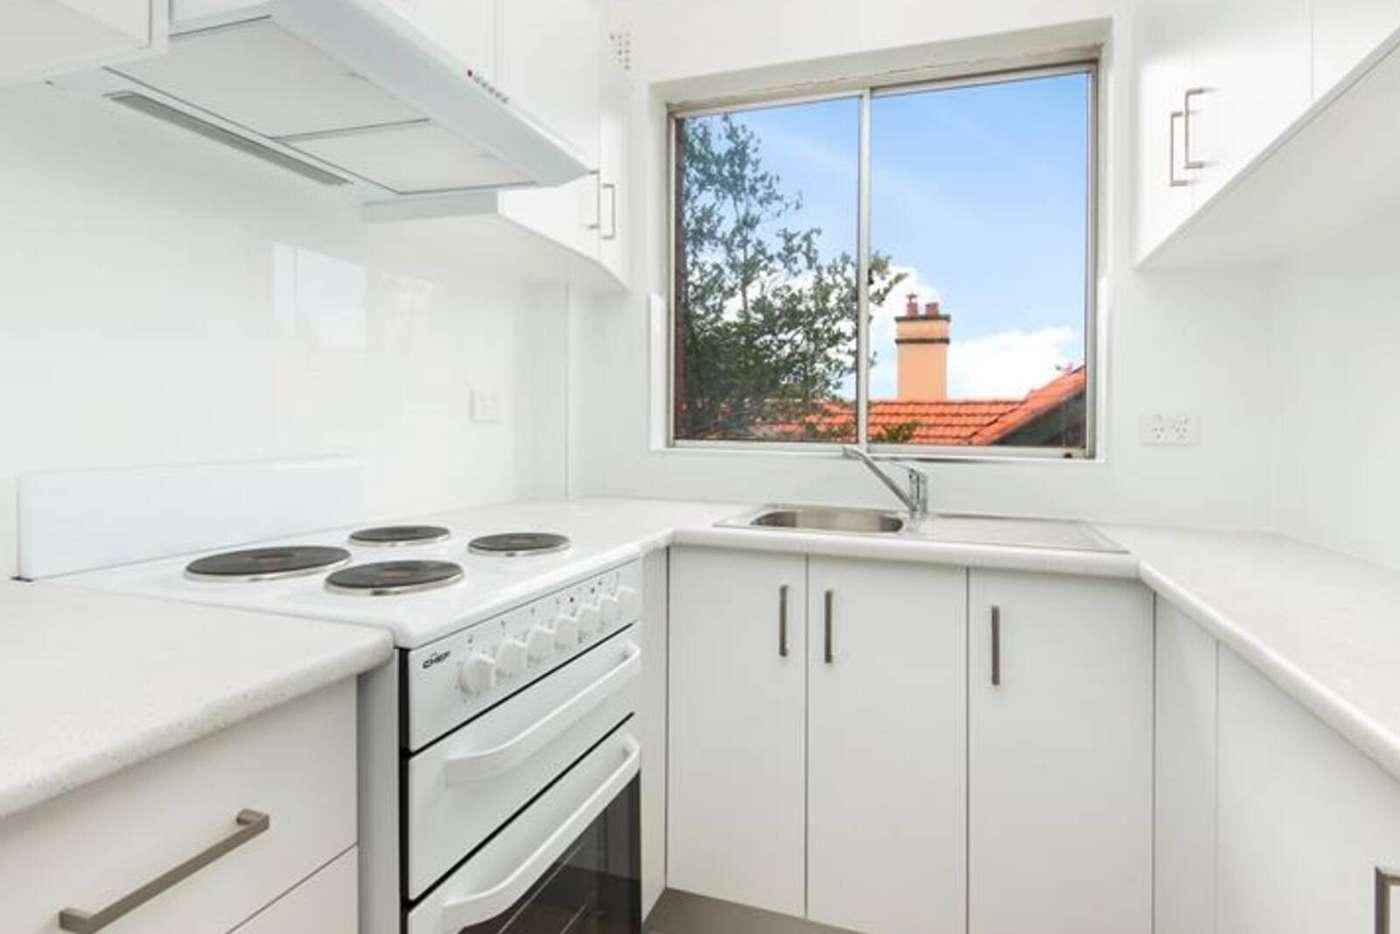 Main view of Homely studio listing, 4/5 Roseville Avenue, Roseville NSW 2069